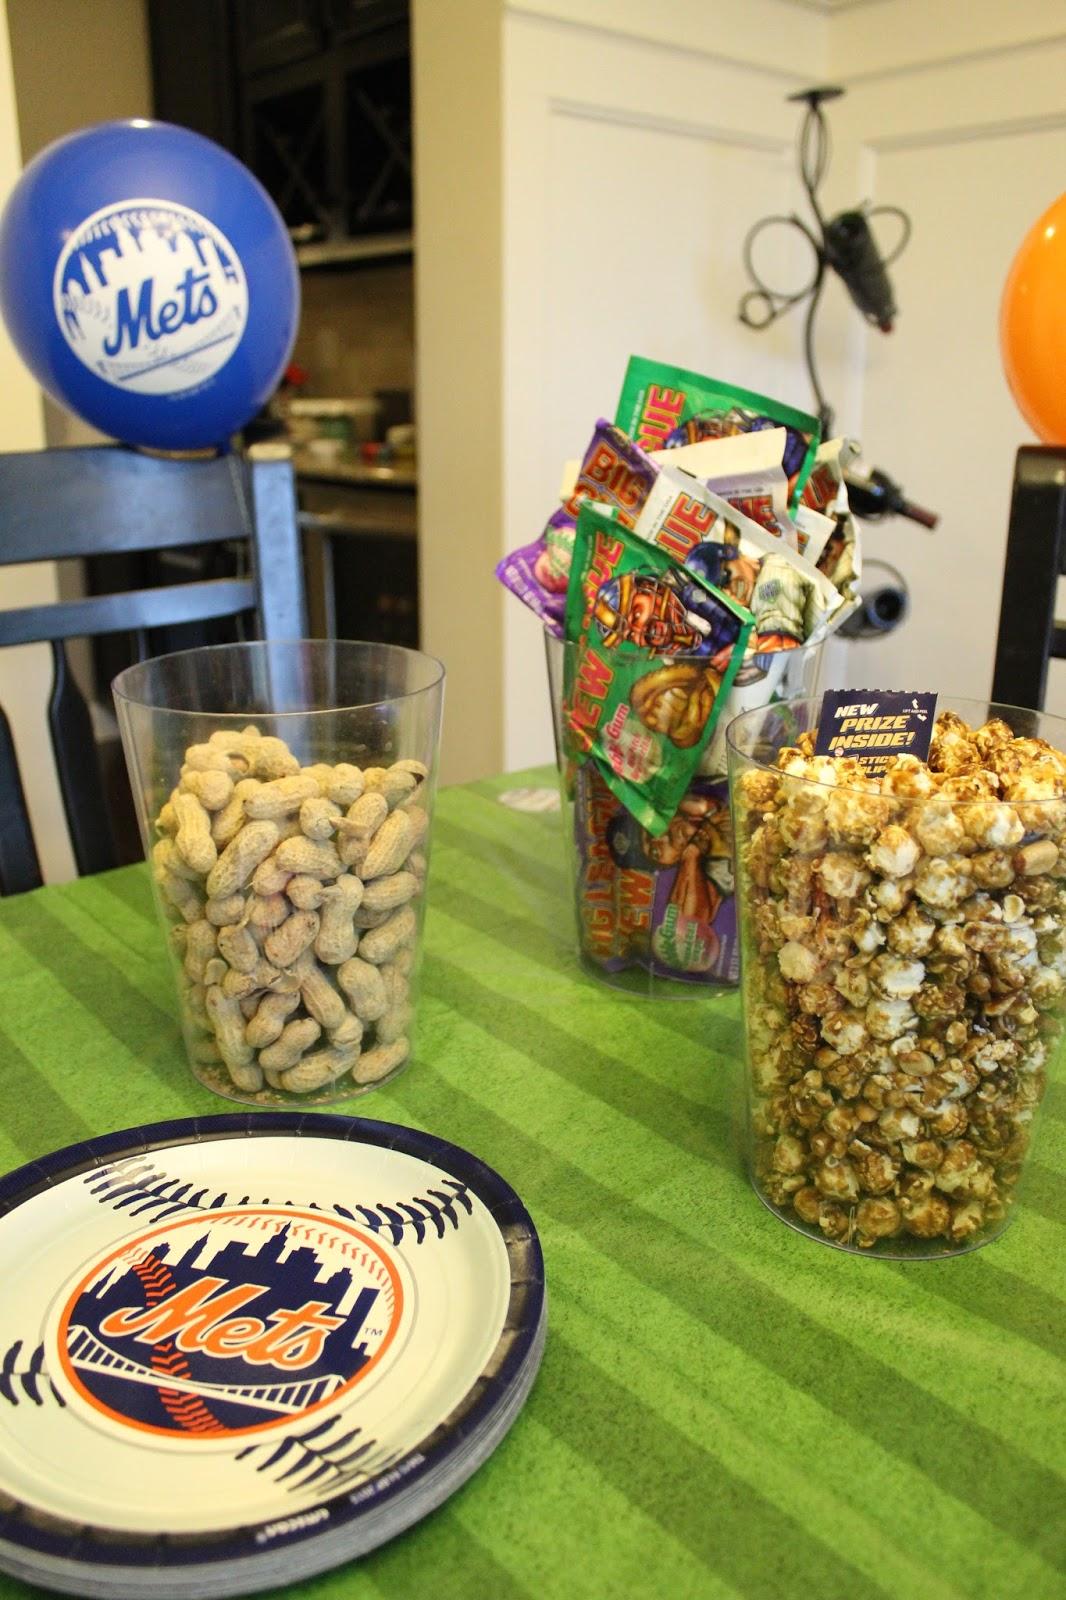 Take me out to the ballgame Baseball party, cracker jacks, big league chew, mets